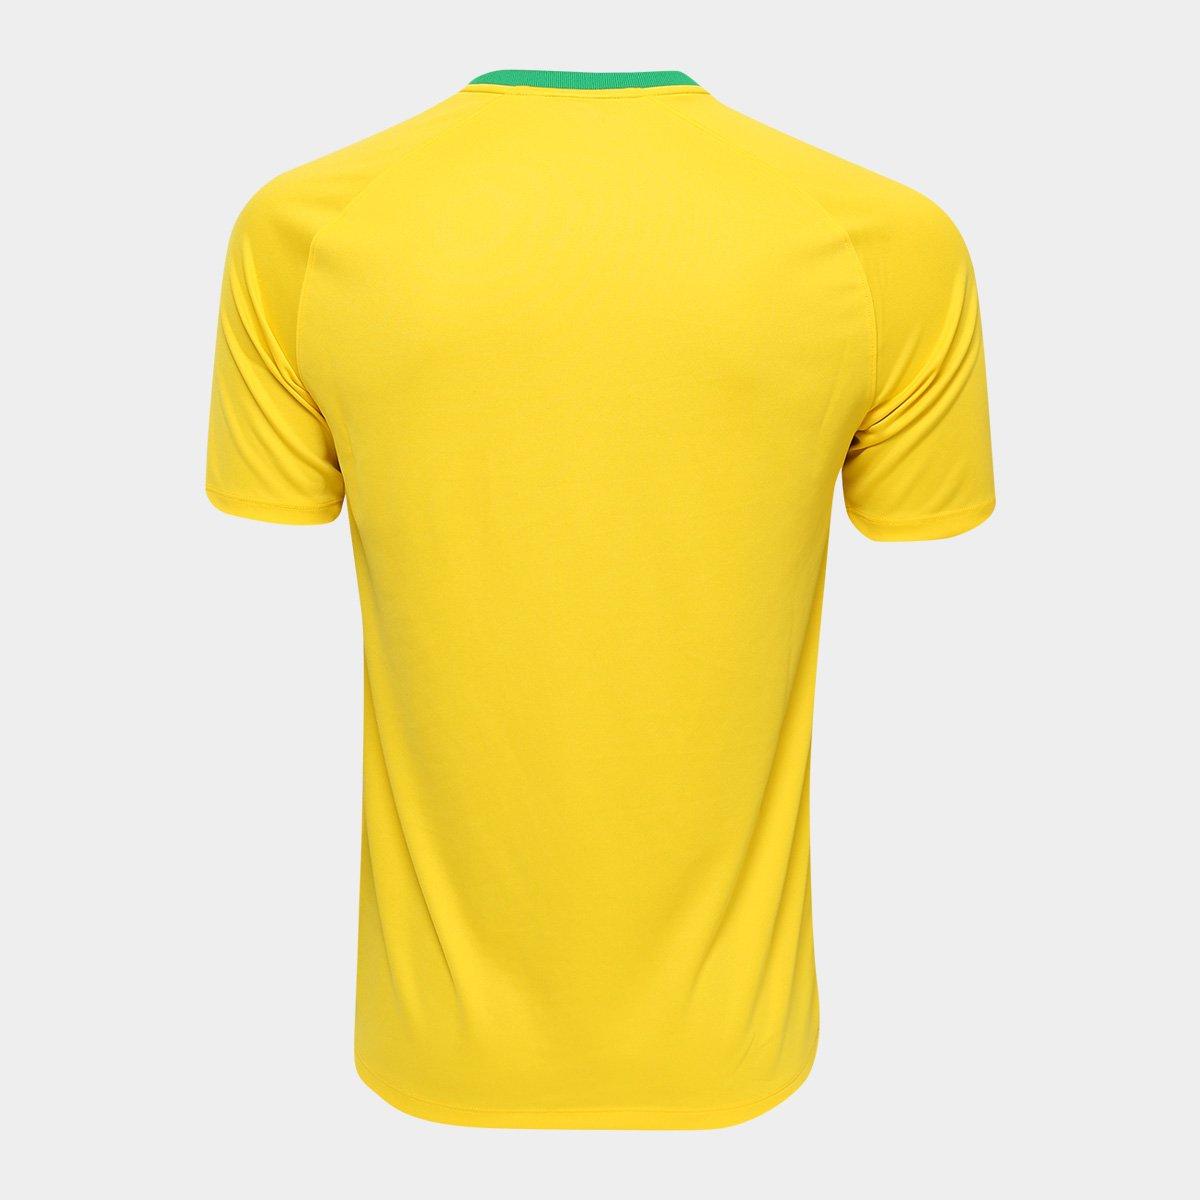 ... Camisa Seleção Brasil I 2018 s n° - Torcedor Estádio Nike Masculina ... 625861dce355c